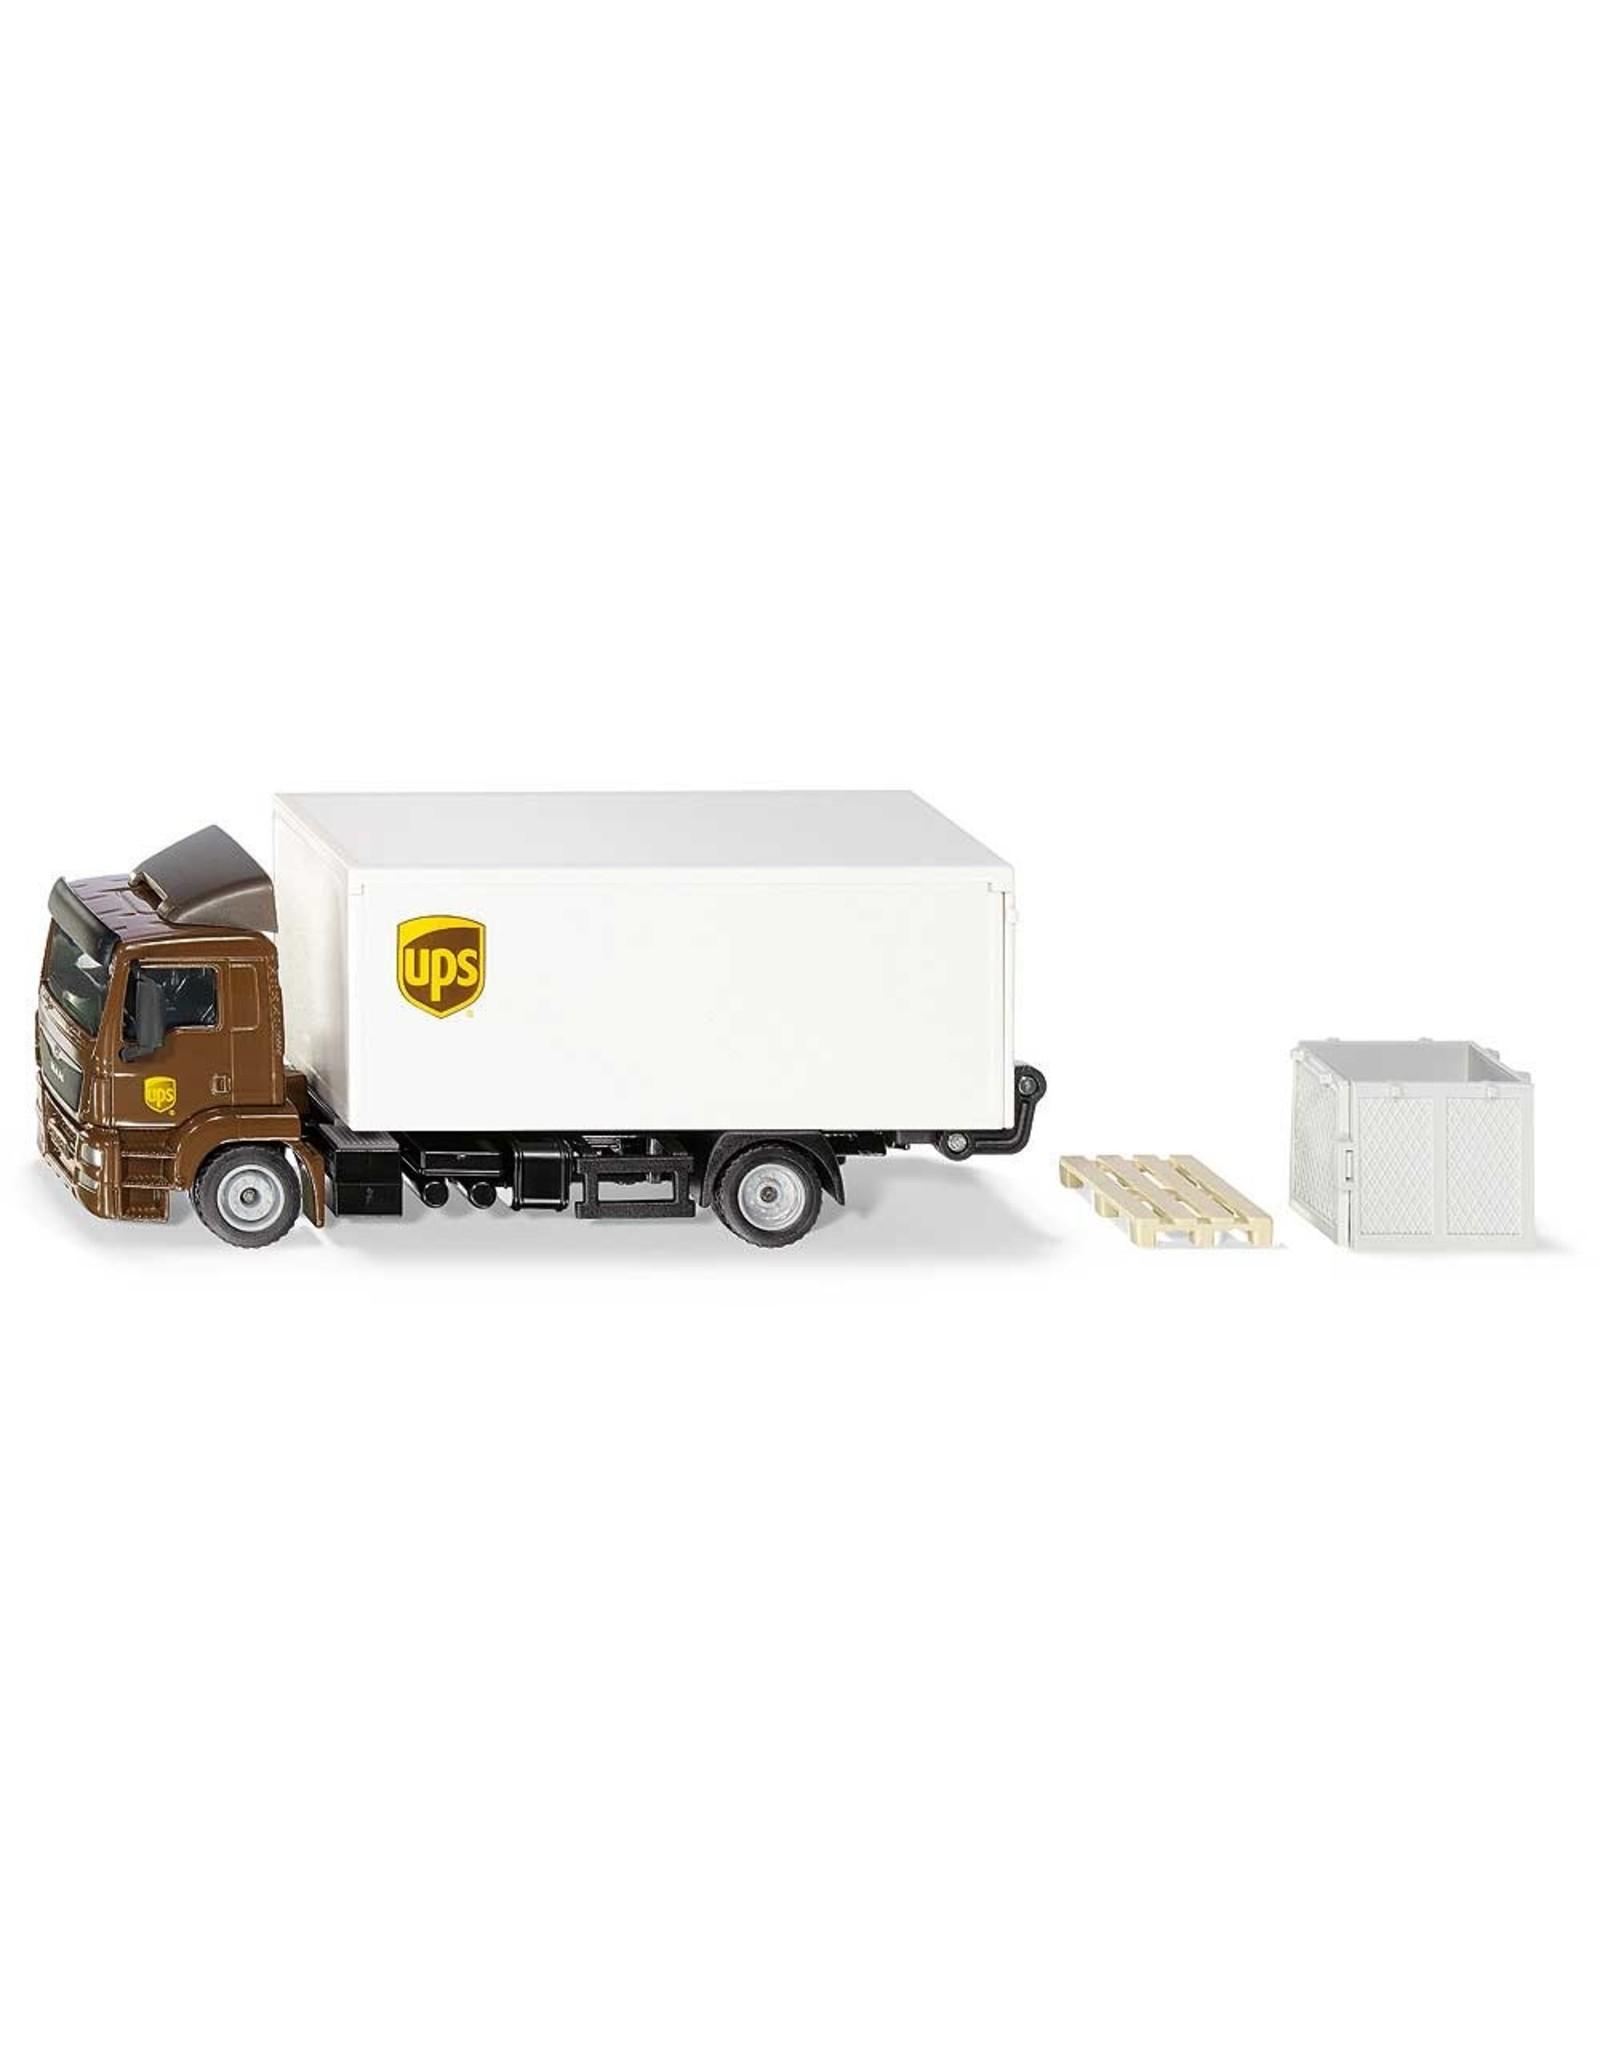 Siku Siku 1997 - 1:50 MAN Truck UPS bakwagen met lift